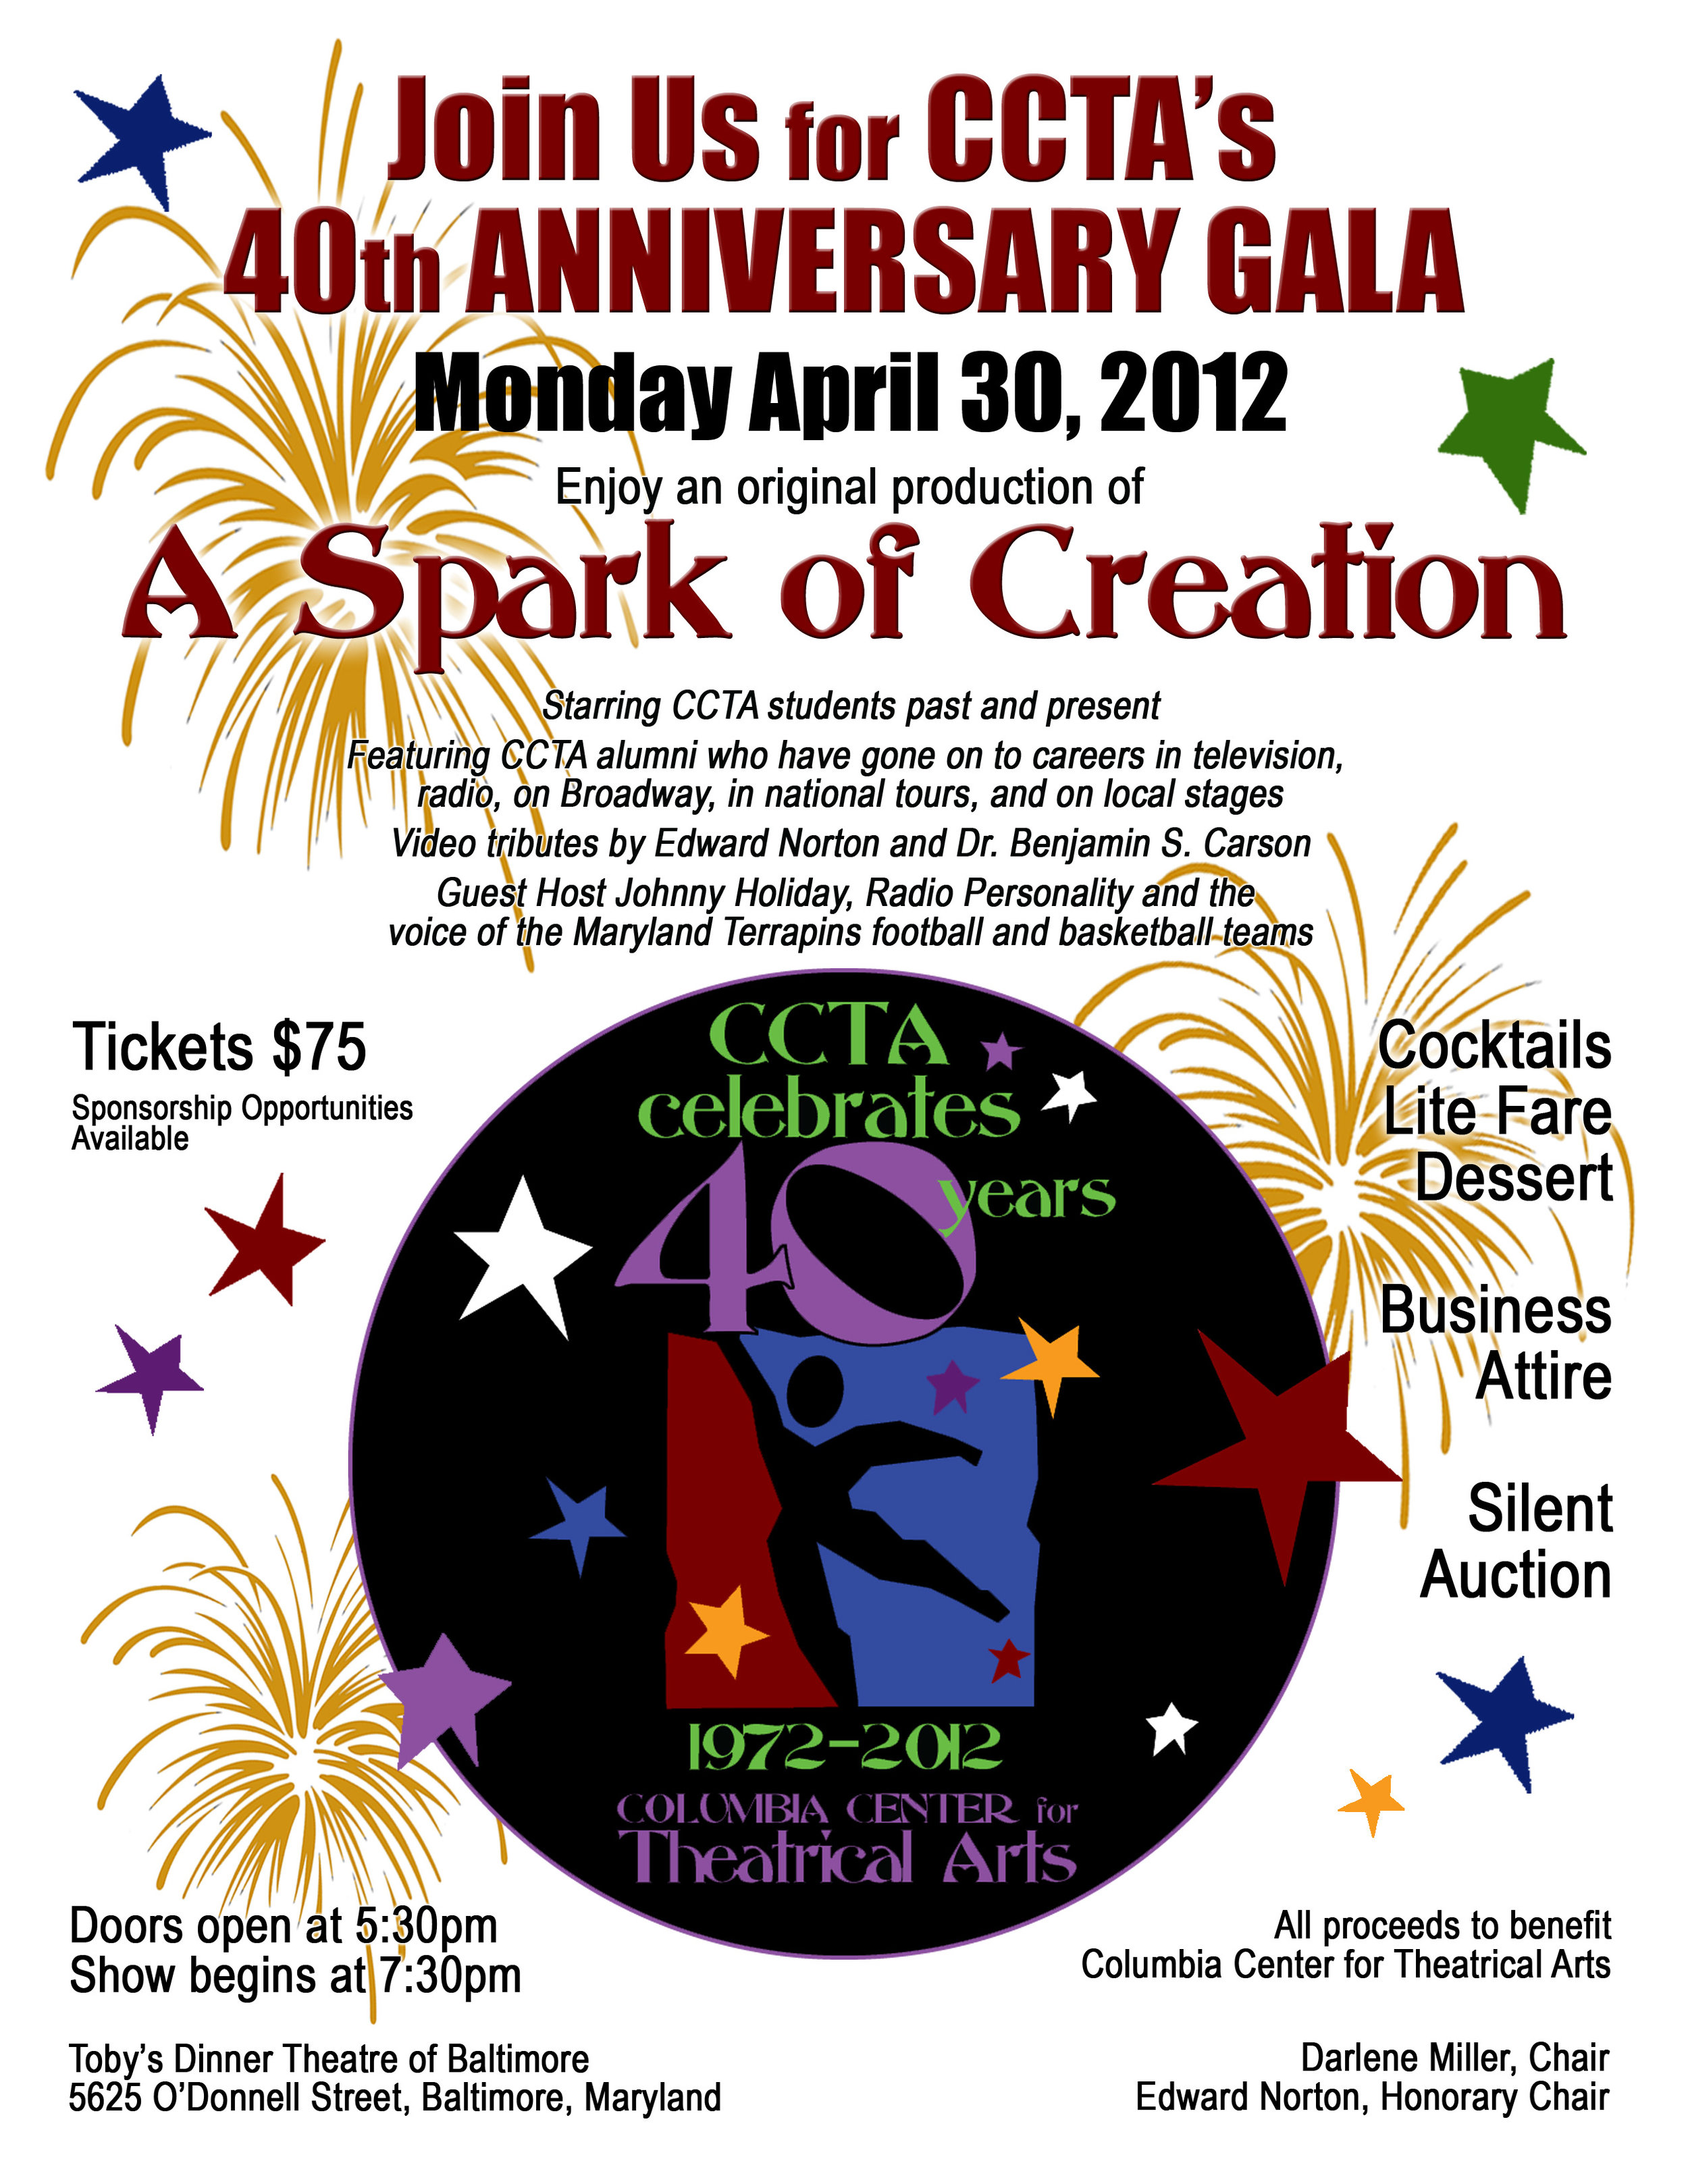 Invitation Flyer - CCTA Spark of Creation 40th Anniversary copy.jpg